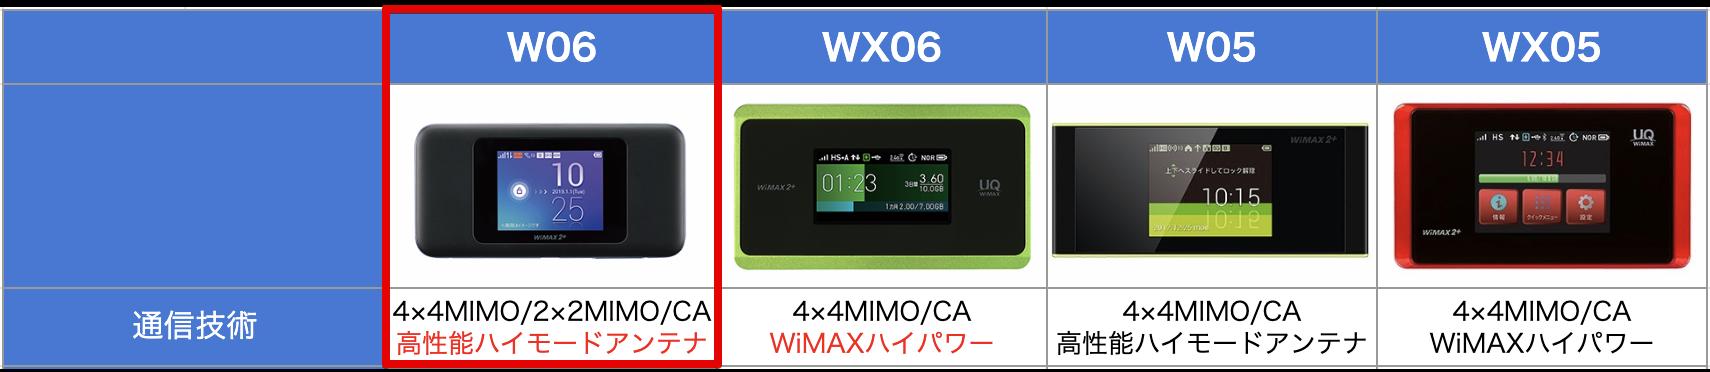 WiMAXの通信規格による違い